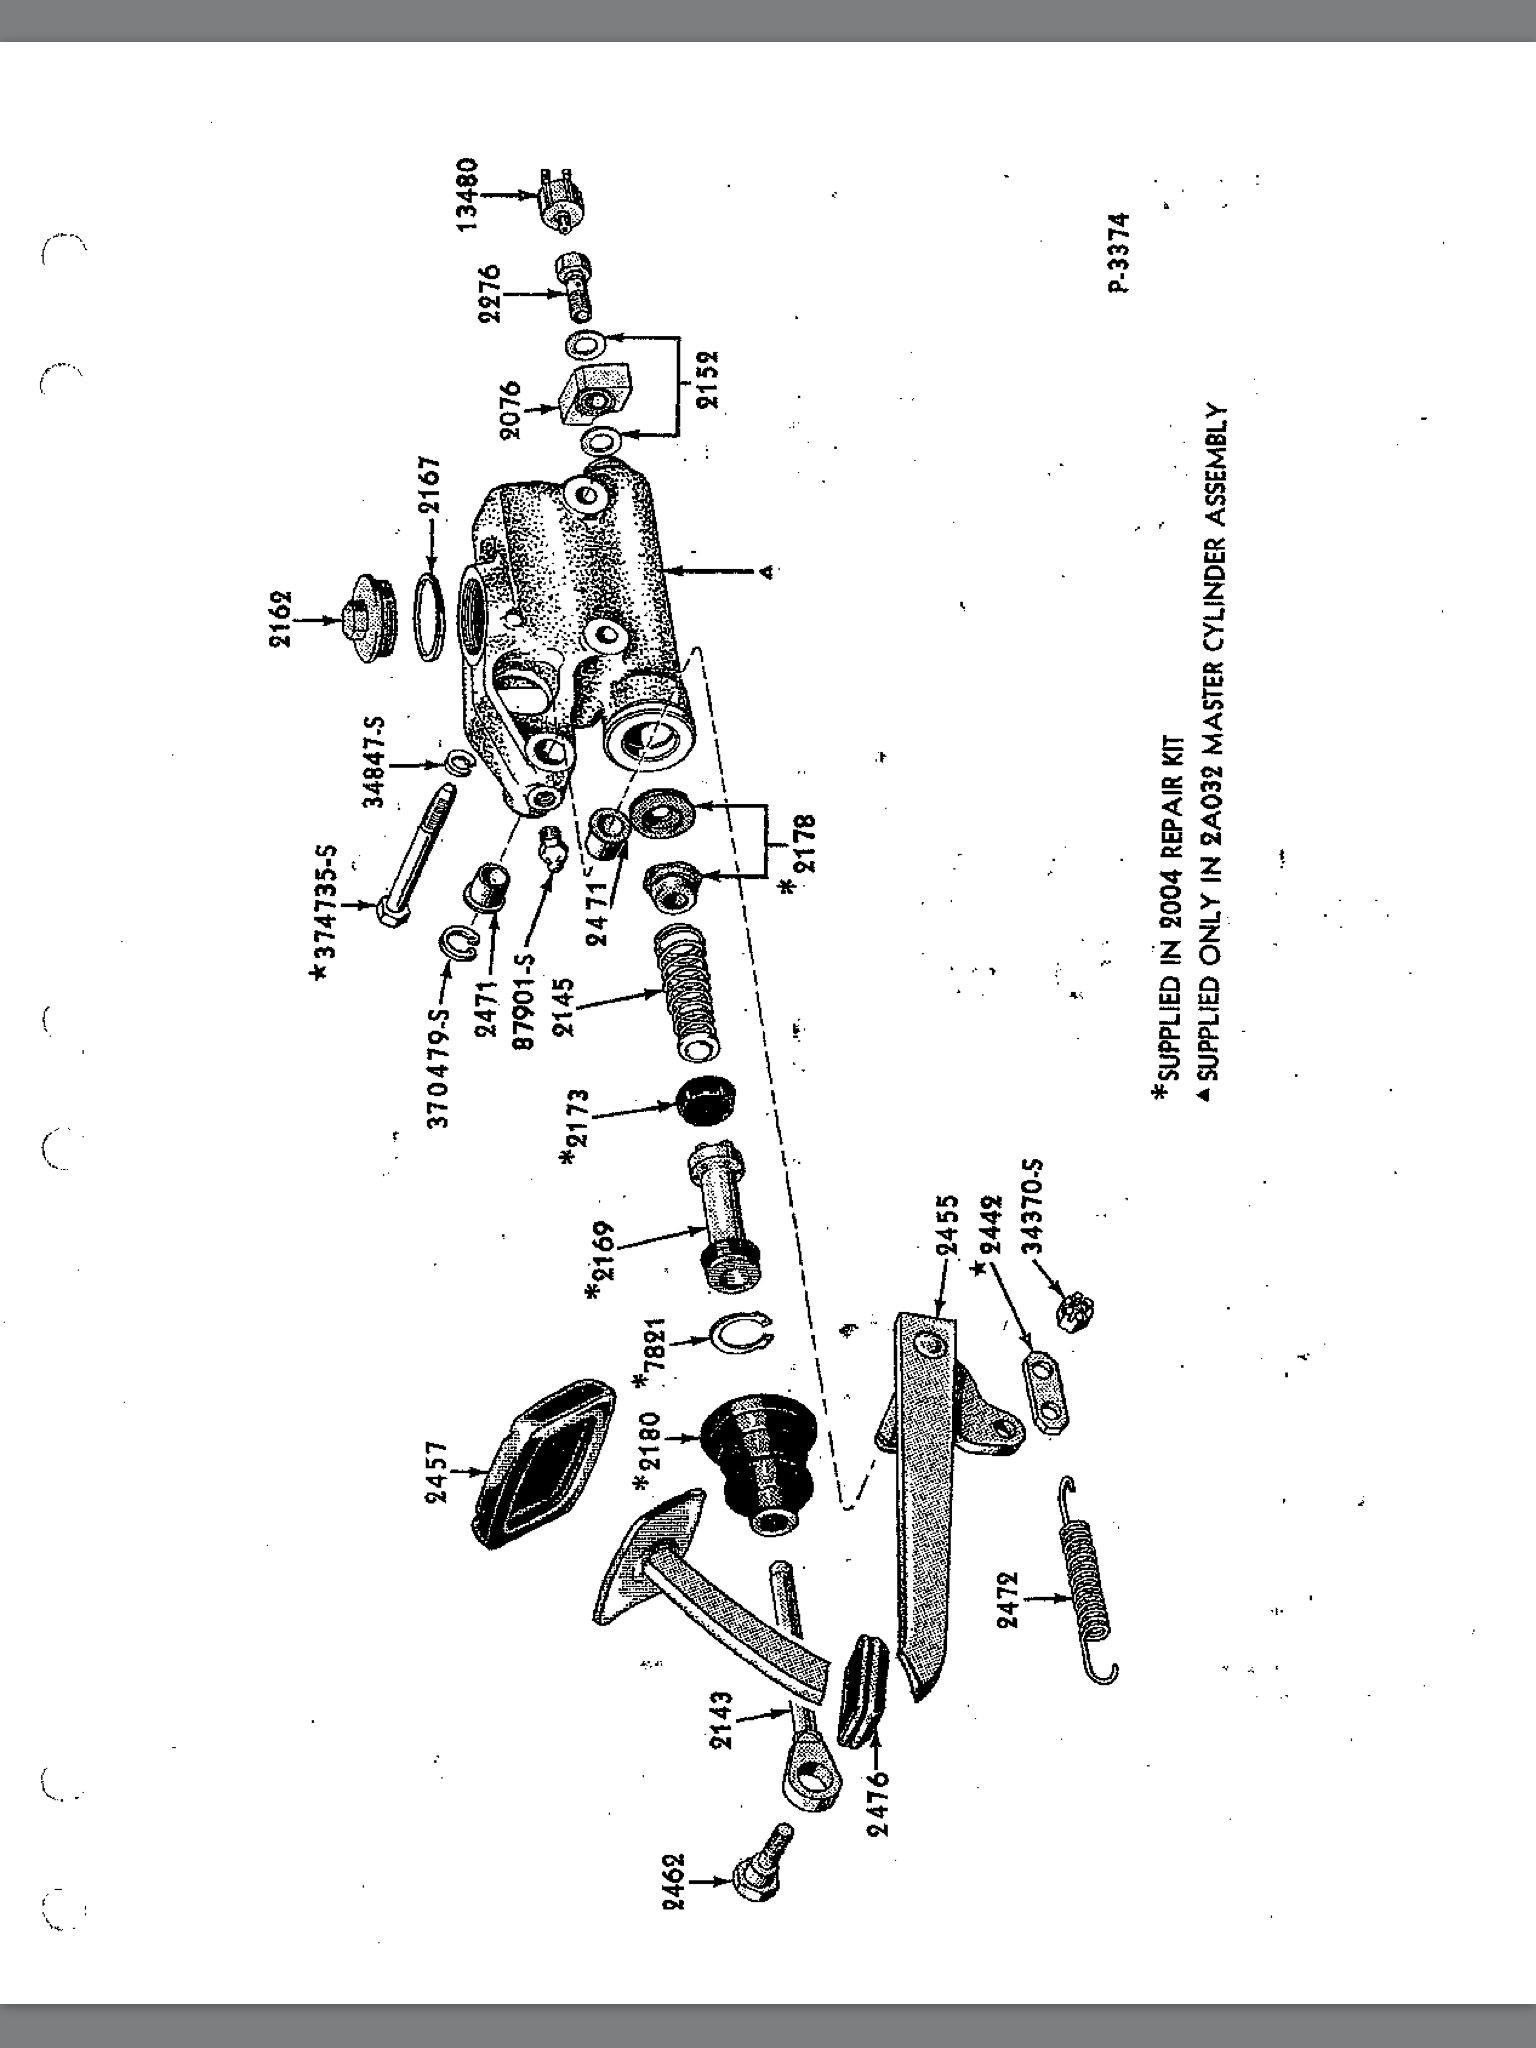 Chevy Master Cylinder Diagram Master Cylinder Exploded View Of Chevy Master Cylinder Diagram